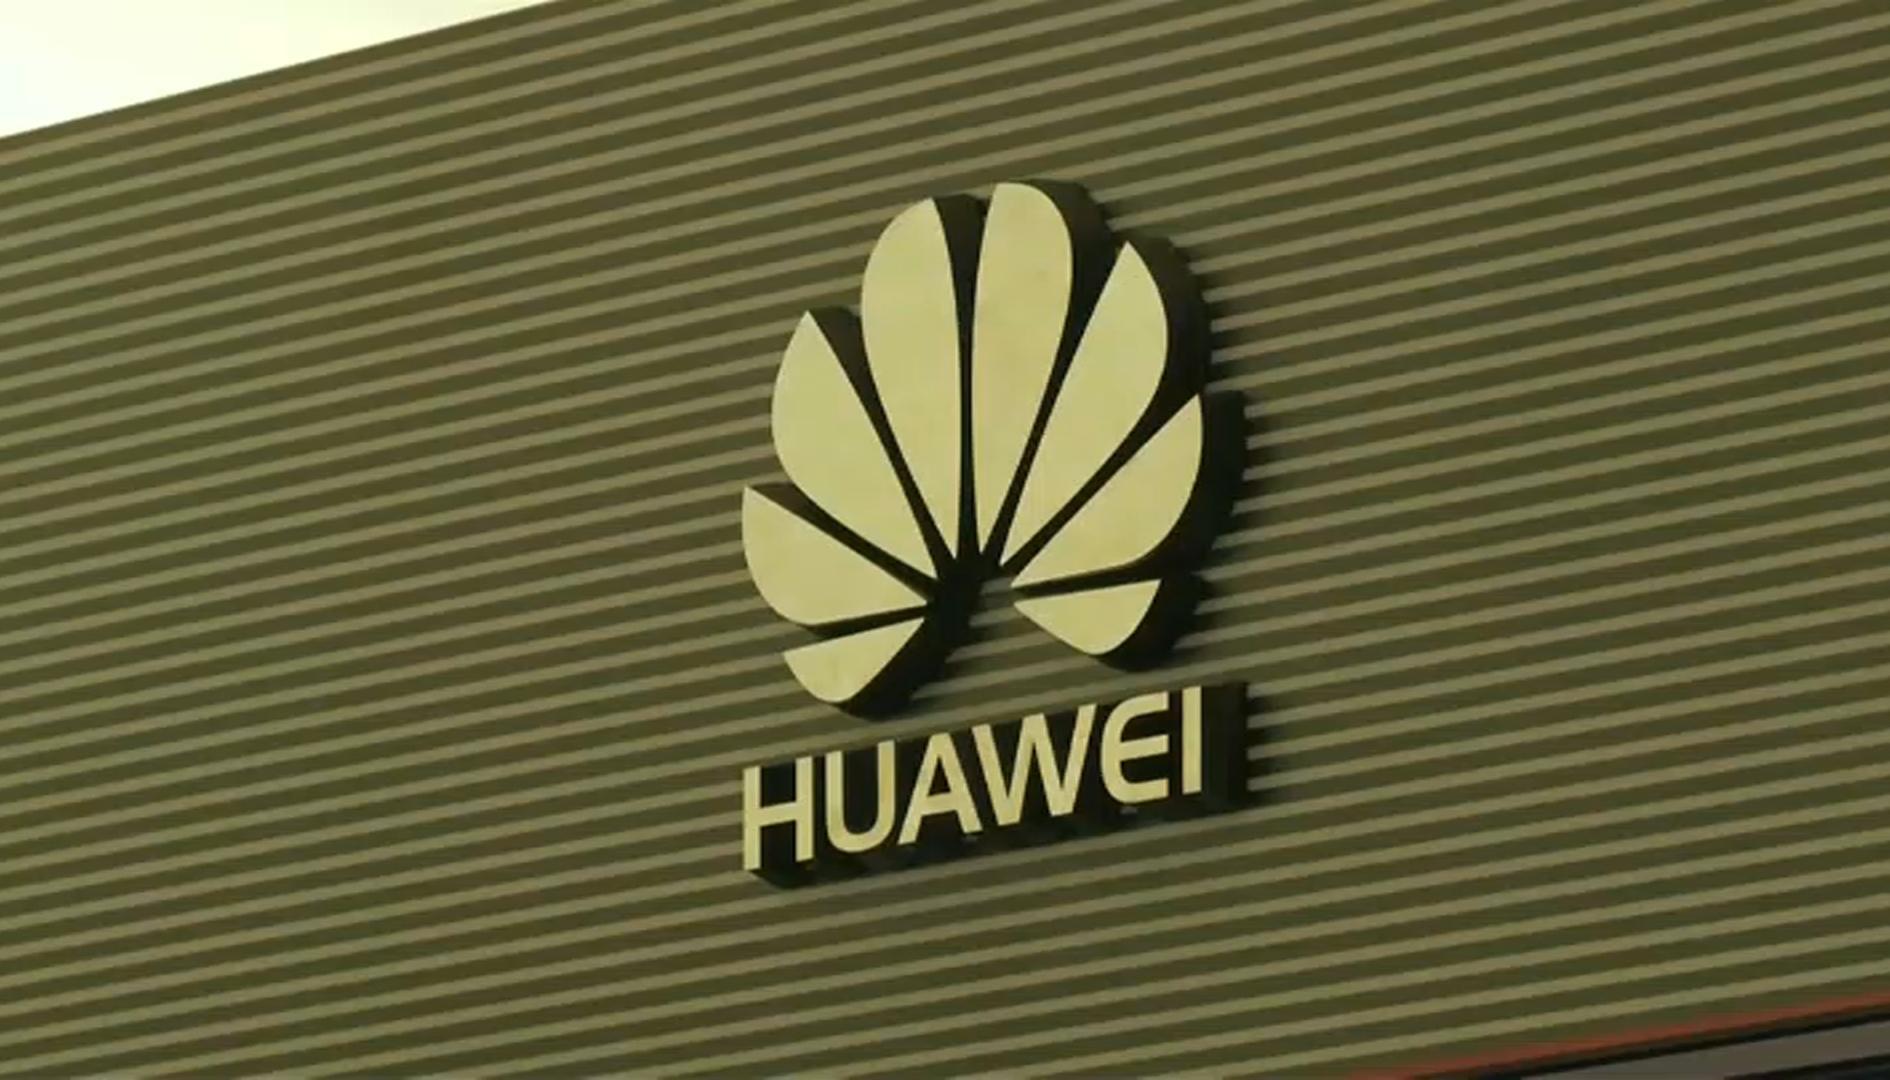 Licenza USA temporanea per Huawei, ma il patron Ren Zhengfei tira dritto